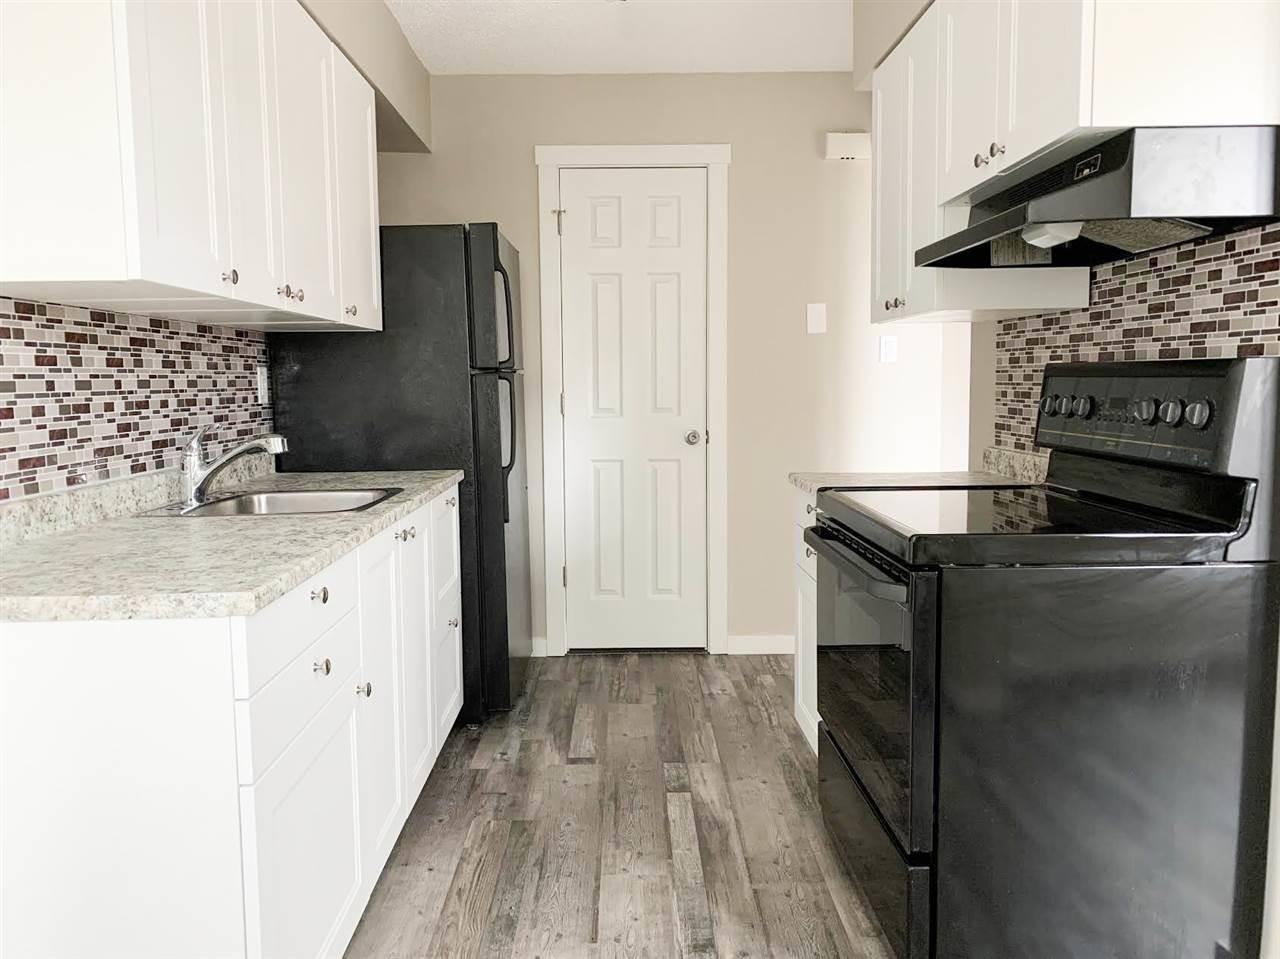 Townhouse for sale at 14125 82 St Nw Unit 7 Edmonton Alberta - MLS: E4181430